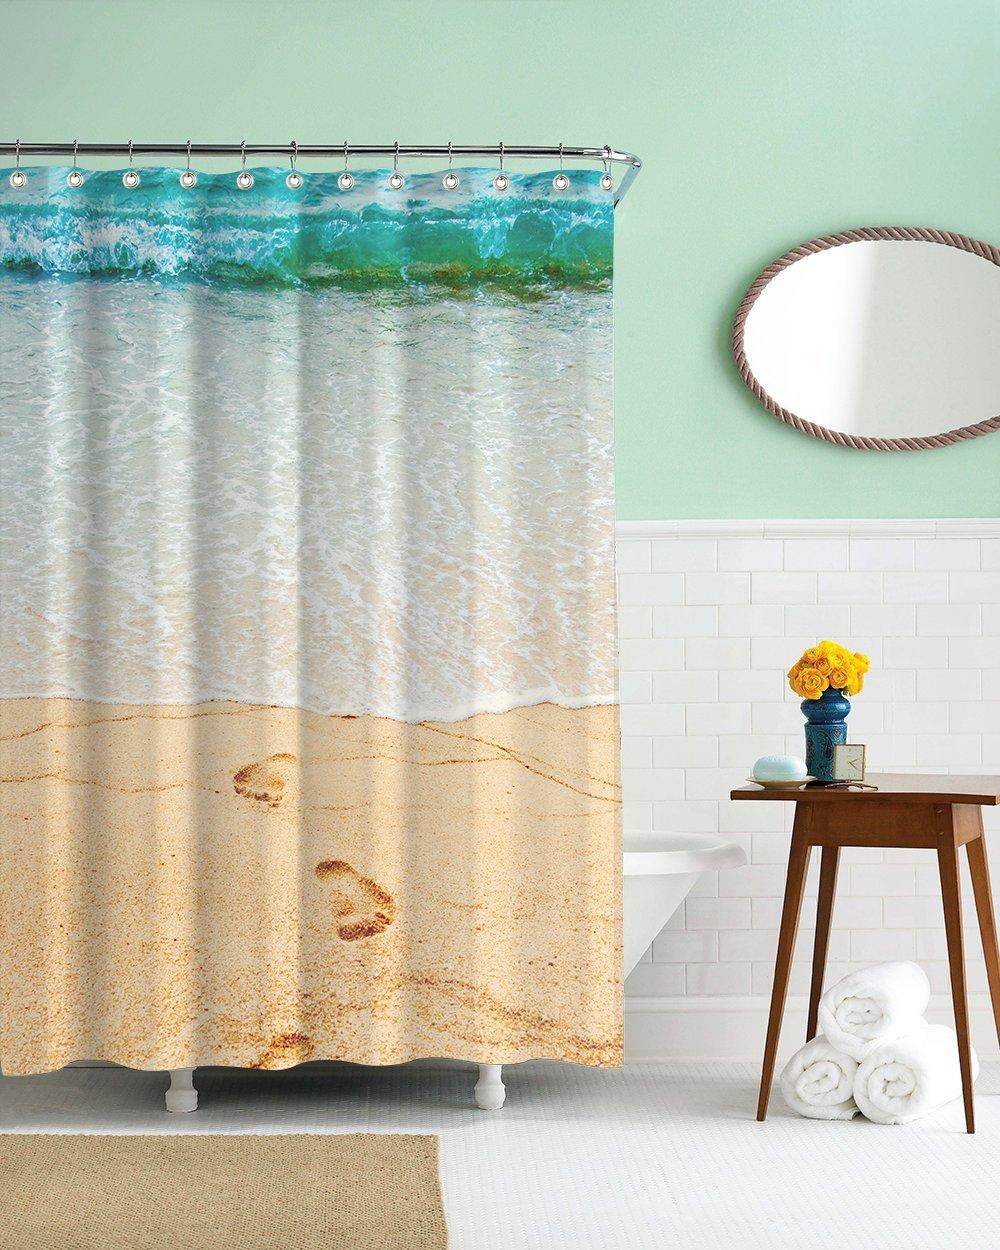 Gwein Beautiful Beach Conch Shower Curtain Polyester Fabric Mildew Proof Waterproof Cloth Room Decor